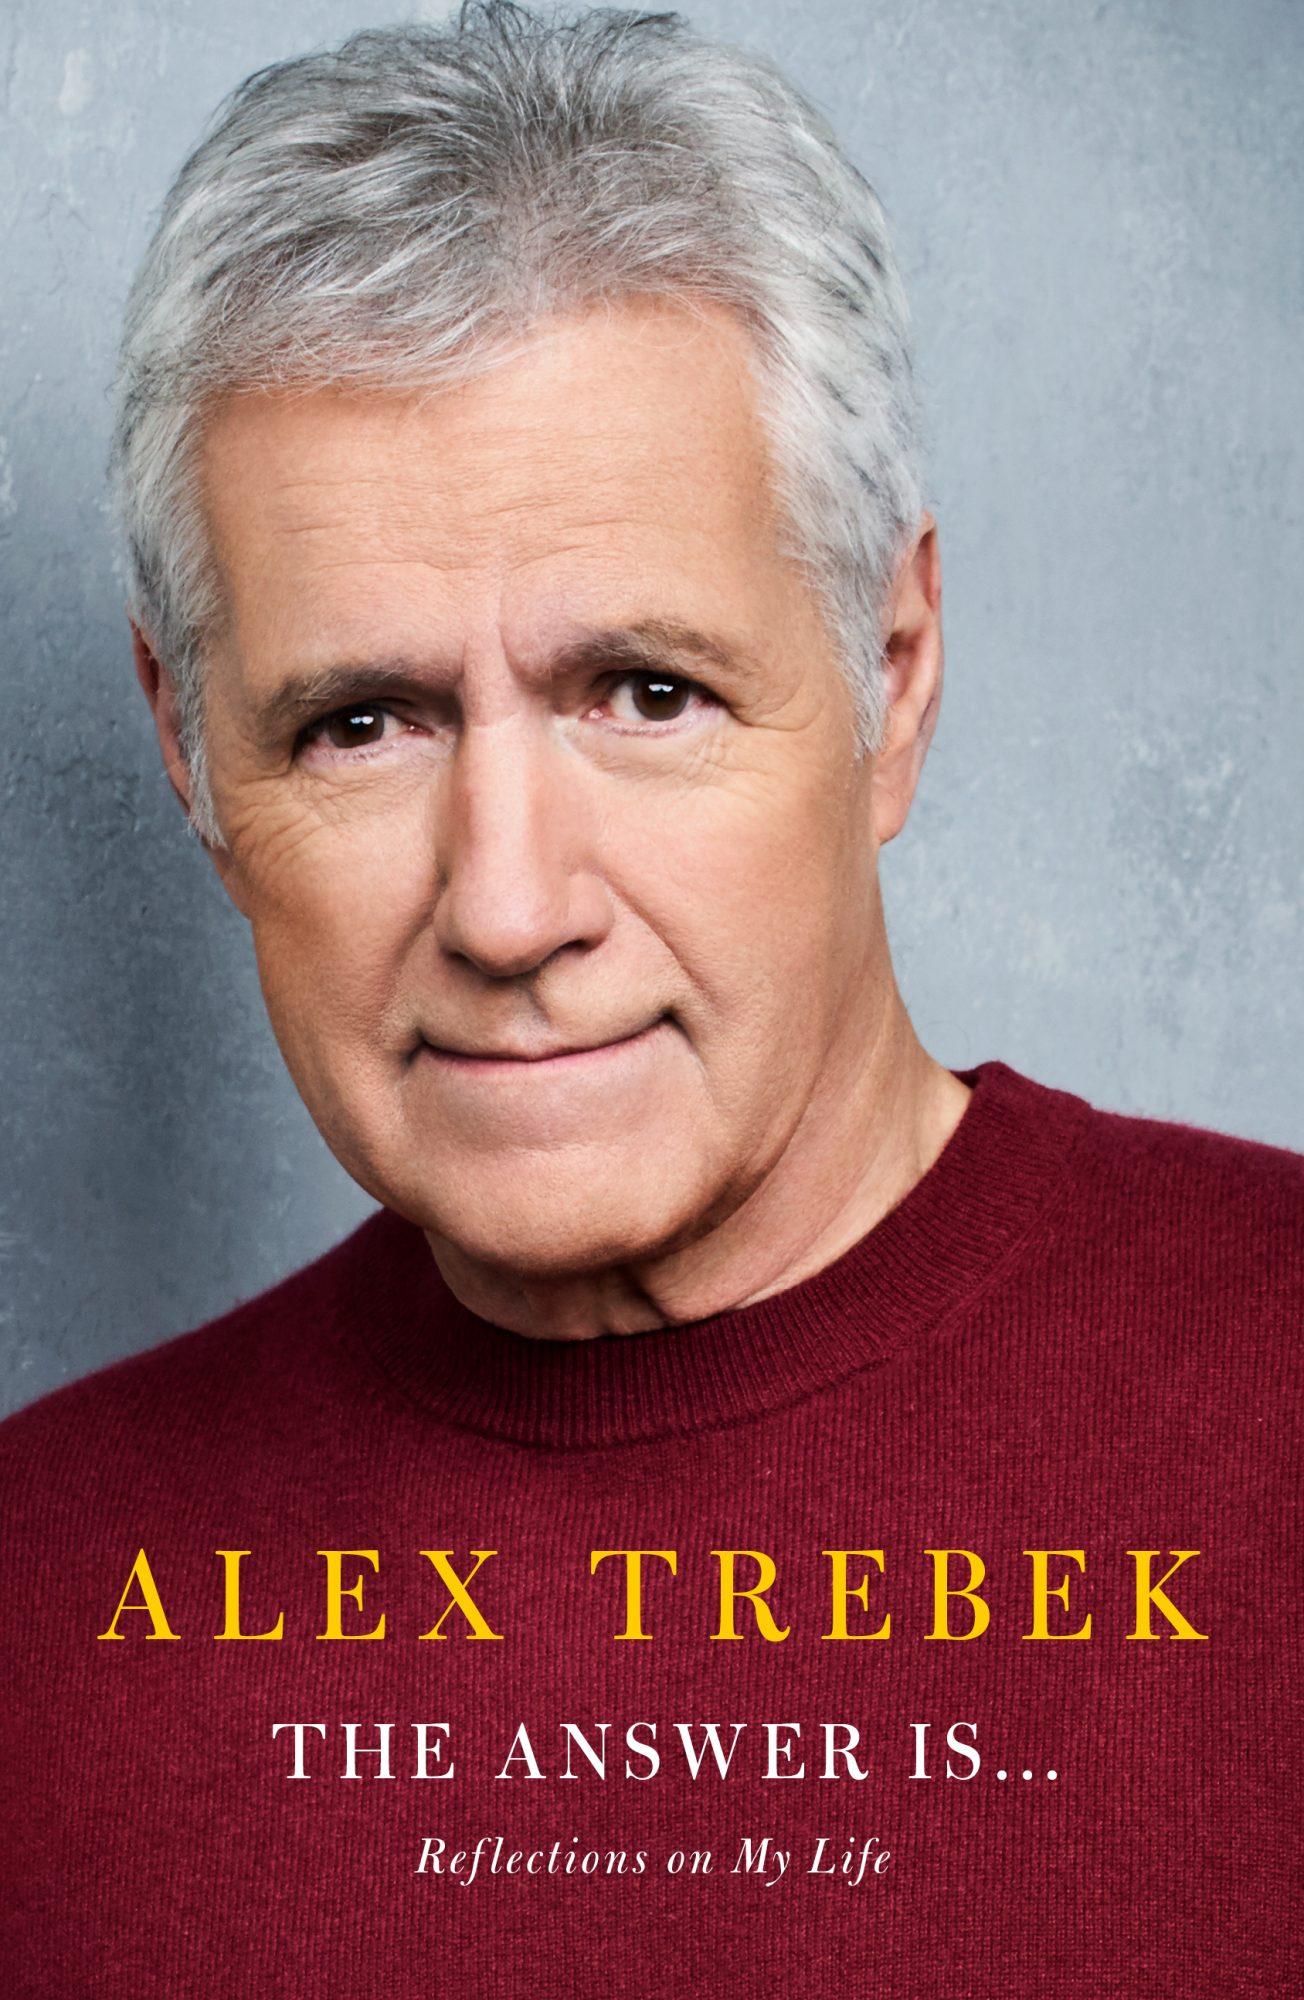 Alex Trebek : The Answer is. . .